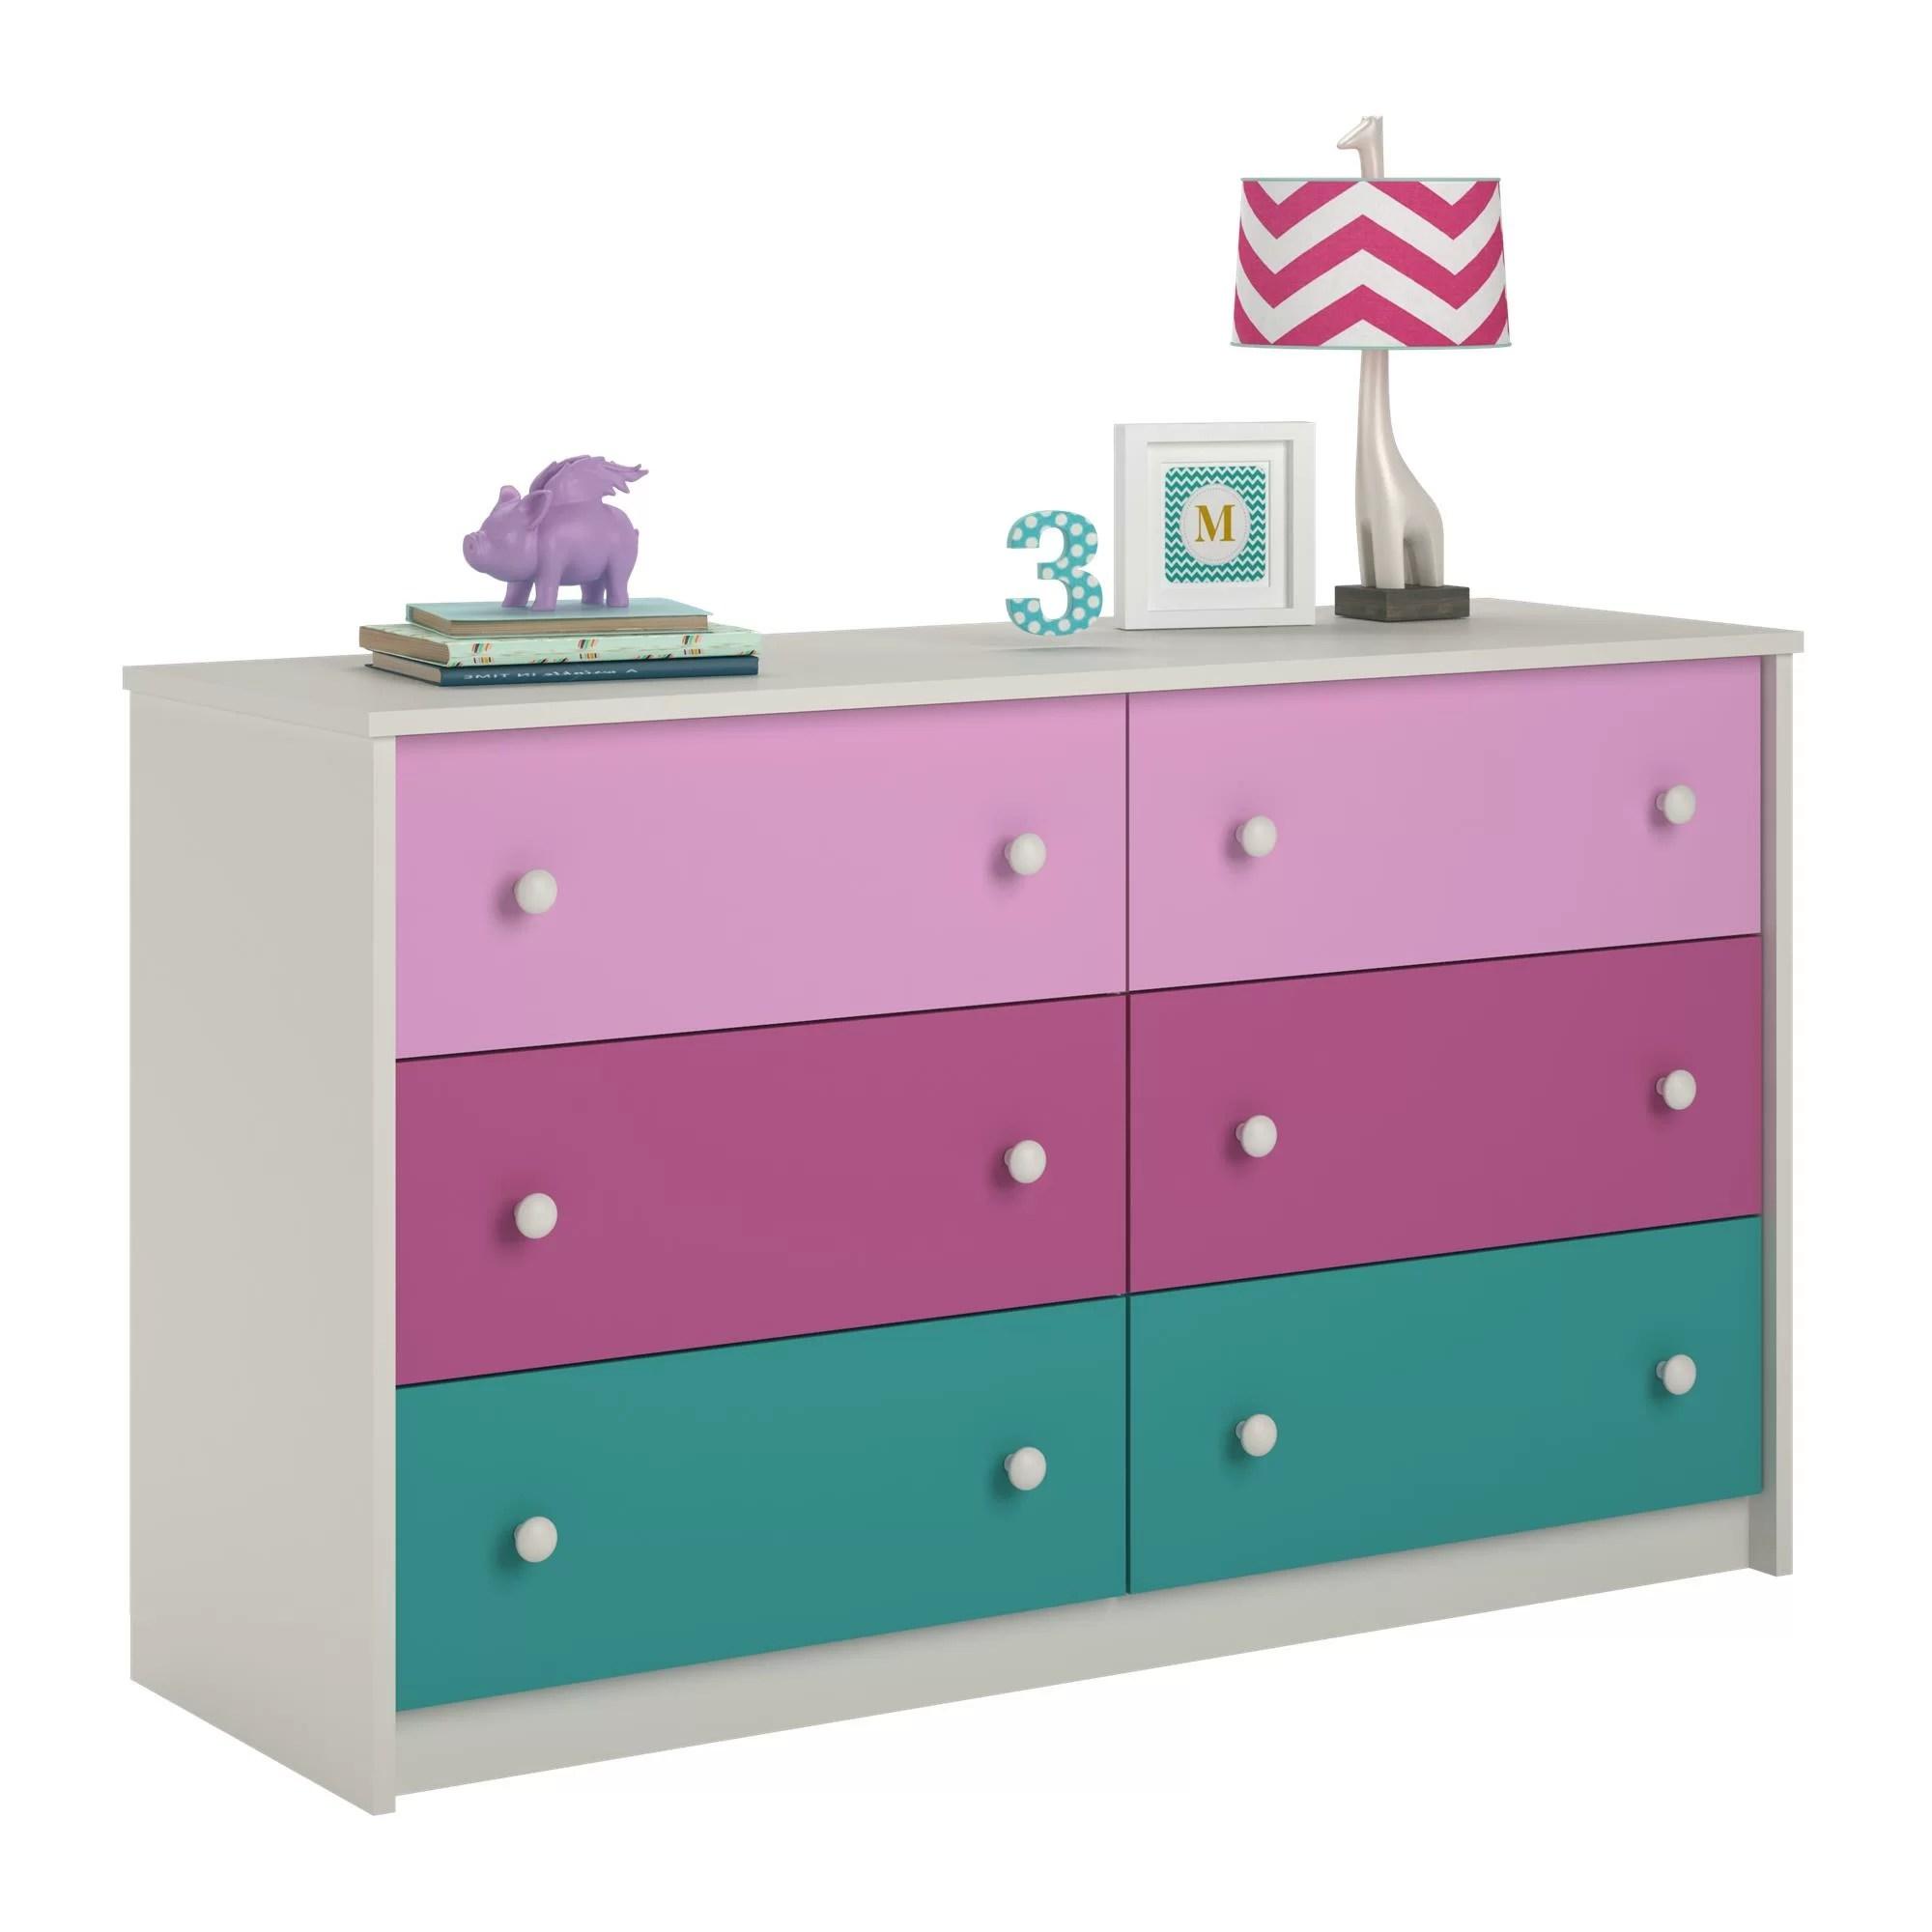 Zoomie Kids Nola 6 Drawer Double Dresser  Reviews  Wayfairca